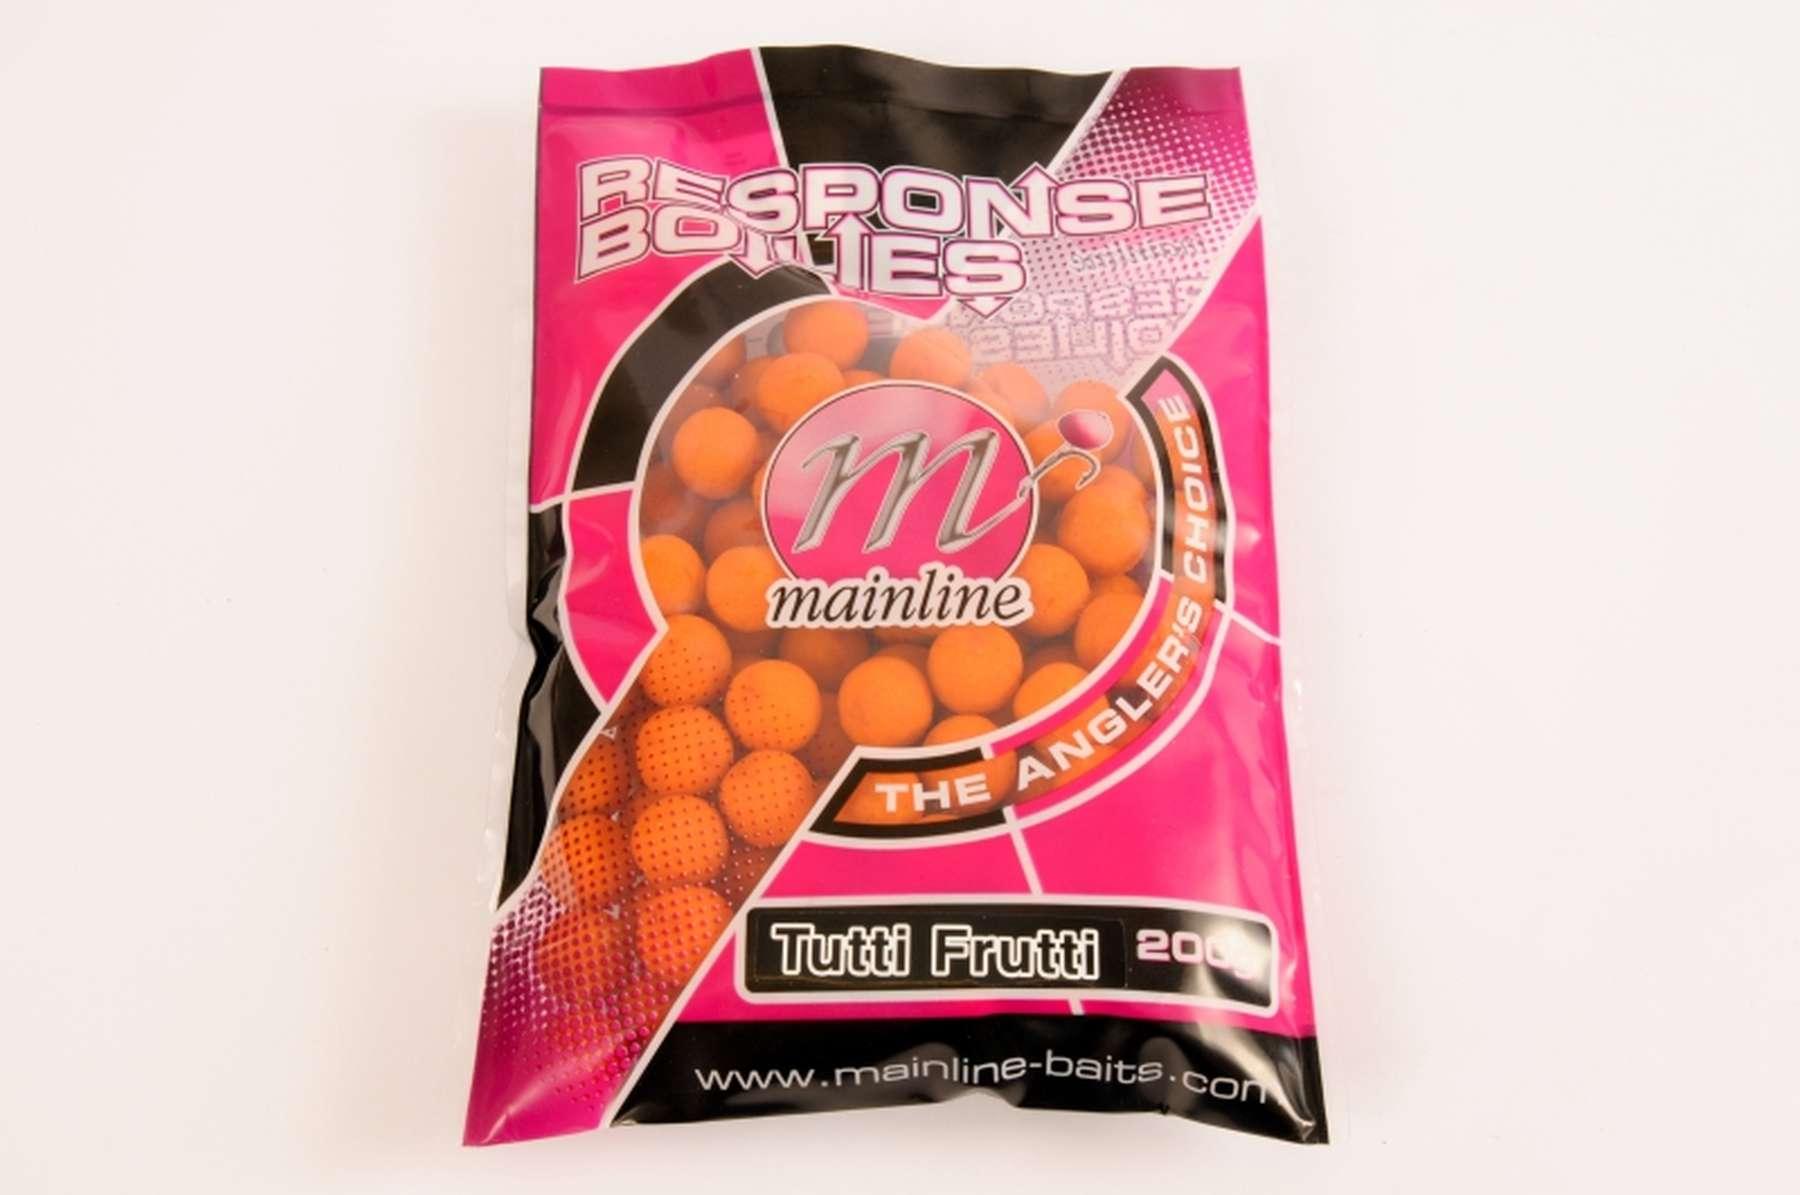 Mainline Baits Response Boilies 10mm